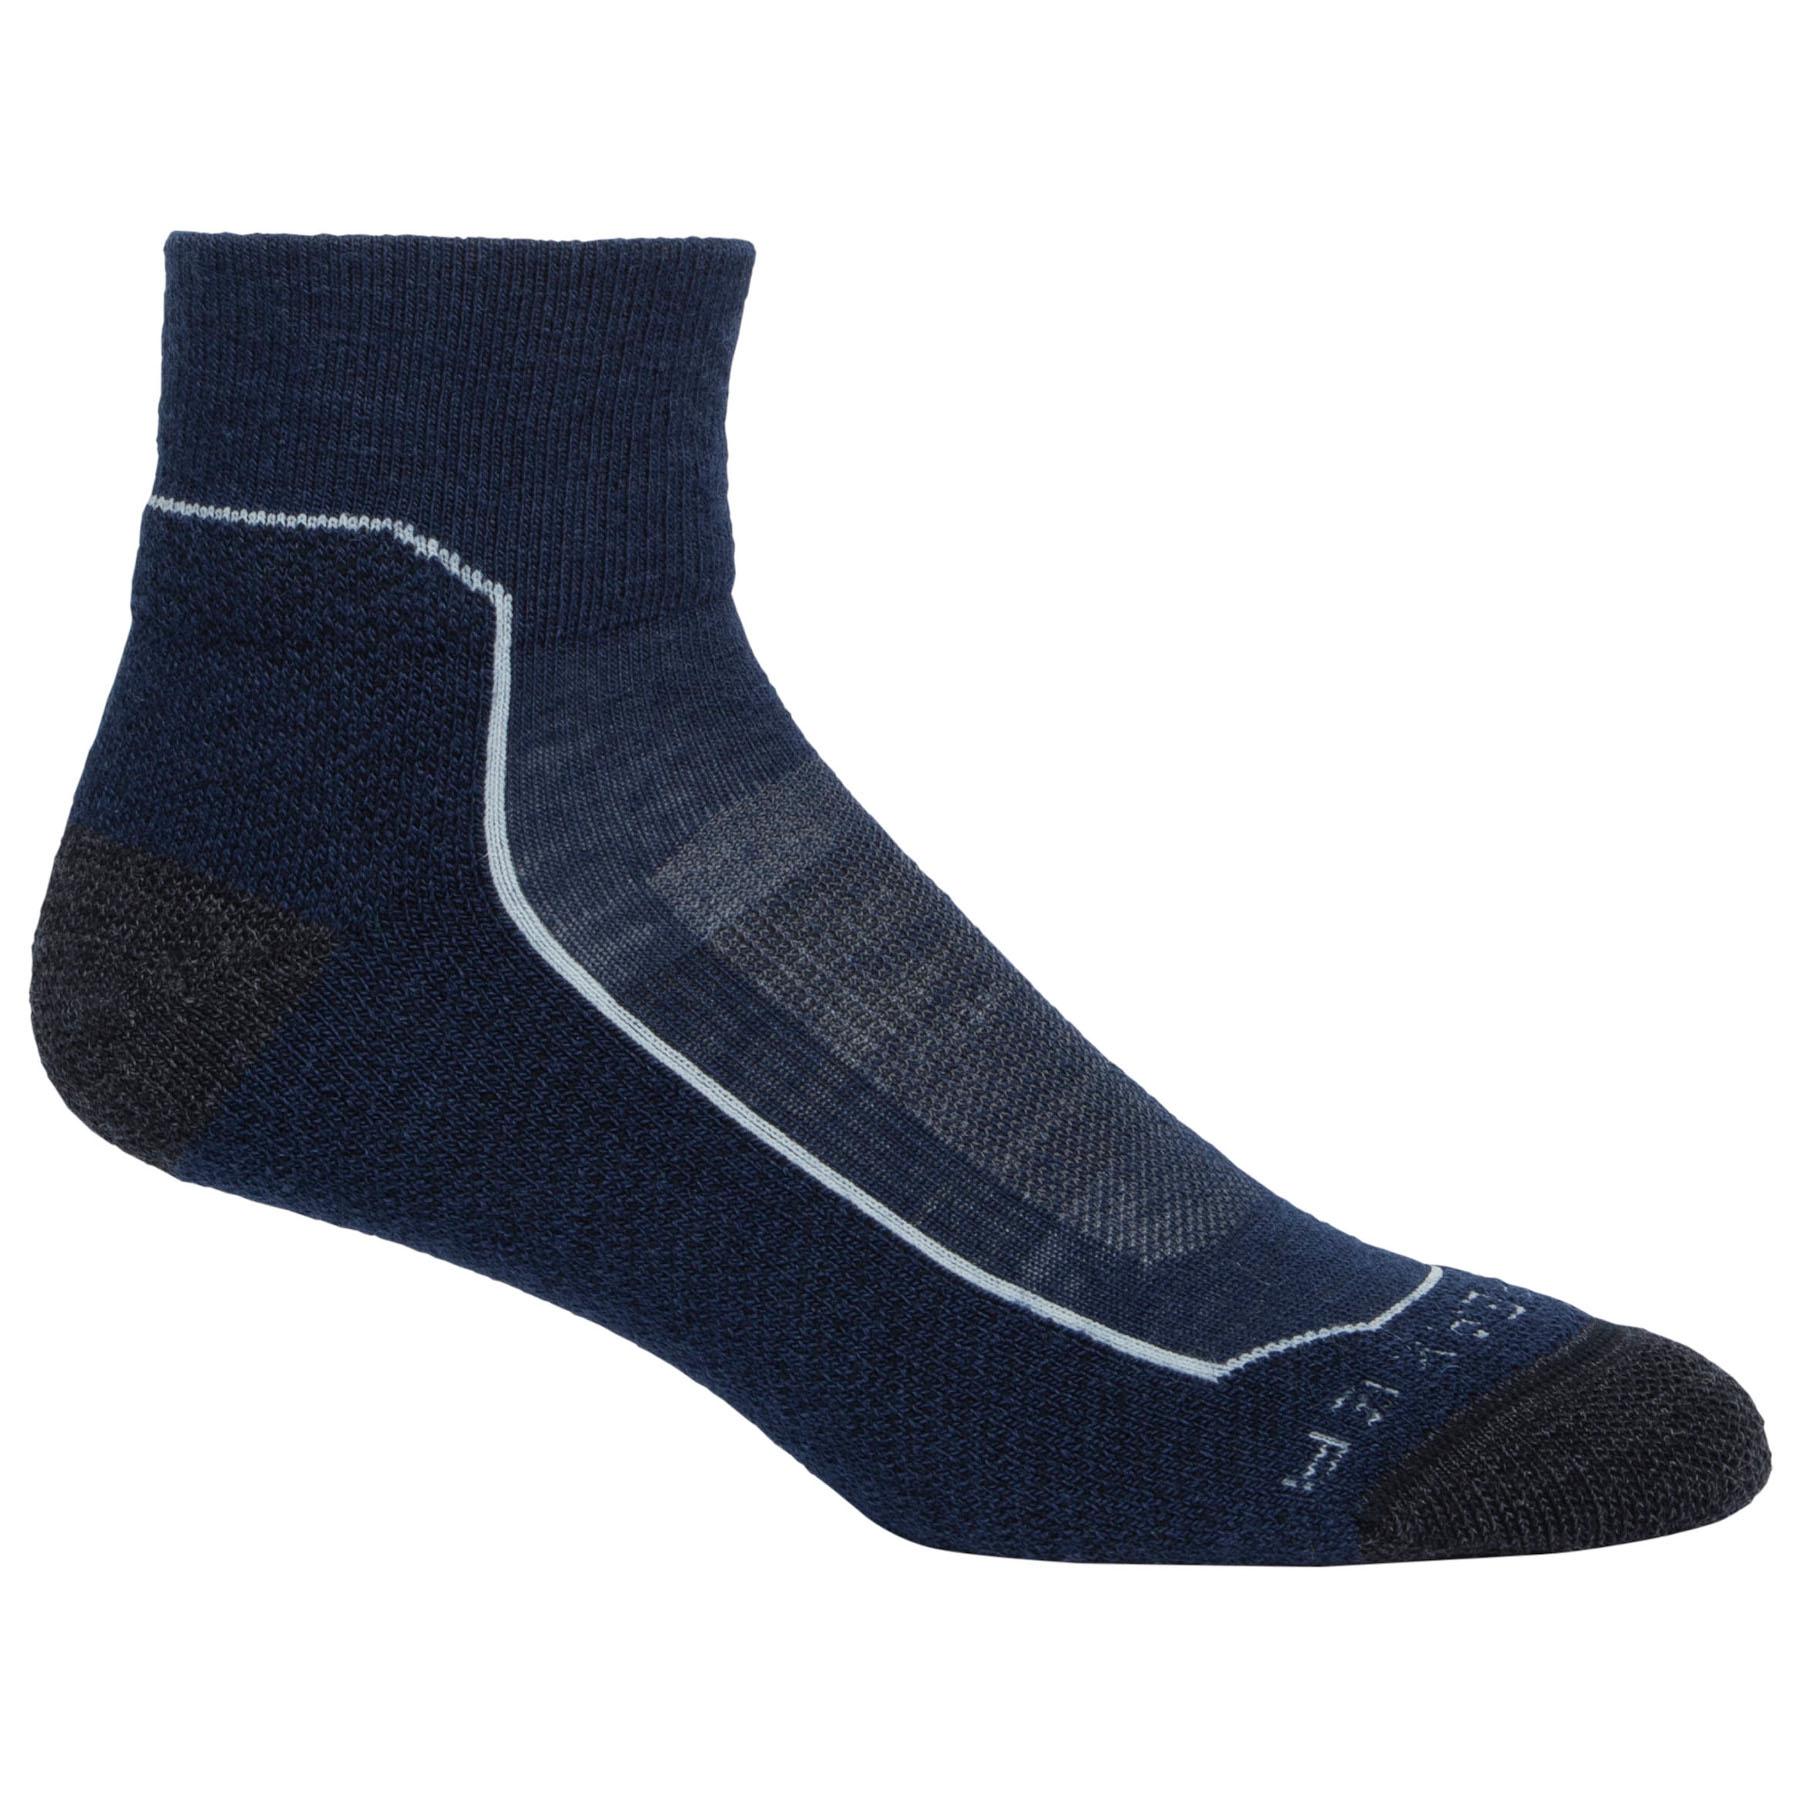 Produktbild von Icebreaker Hike+ Light Mini Herren Socken - Midnight Navy